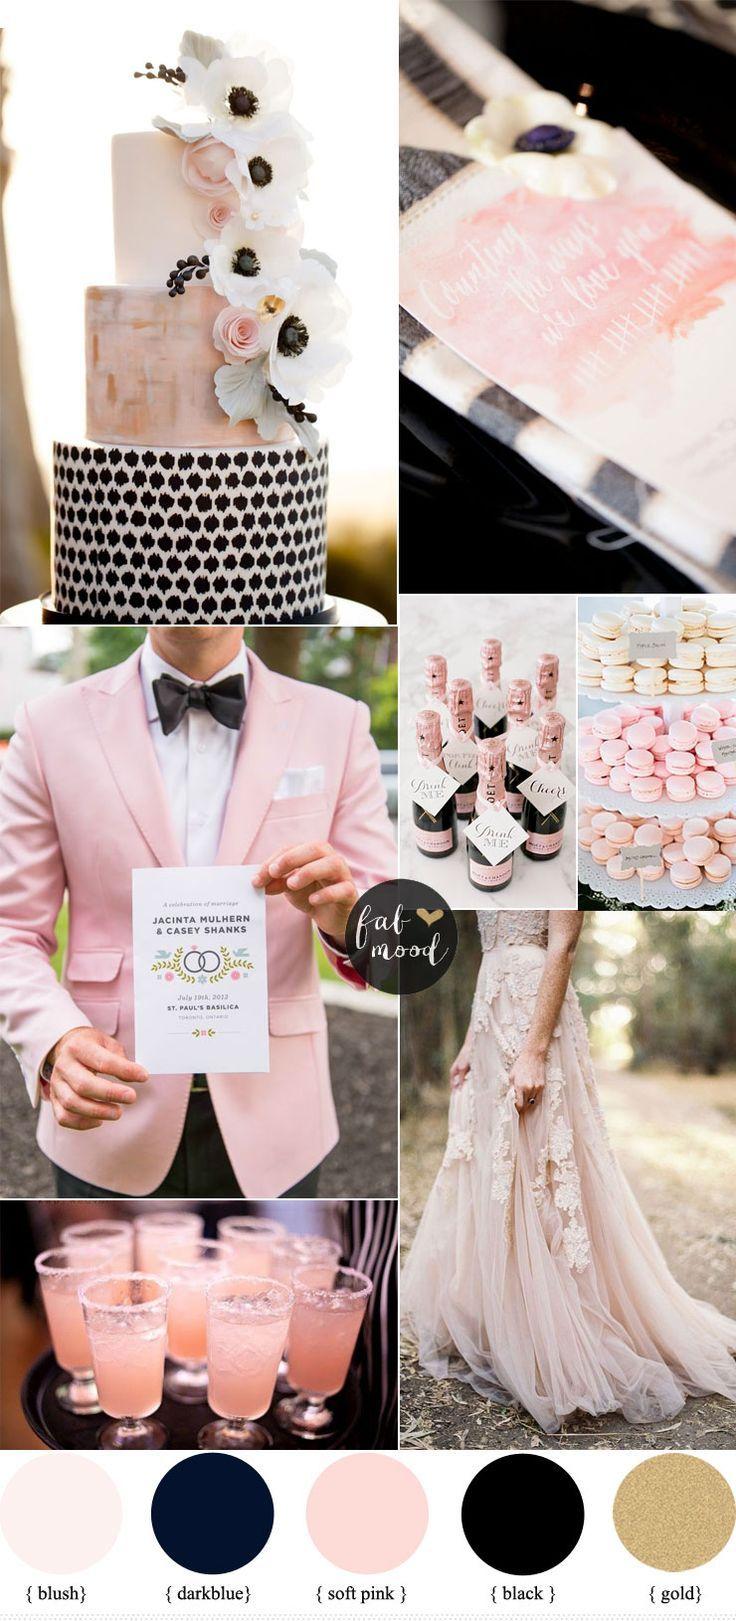 blush wedding ideas, blush and black wedding colors, modern wedding ideas, kate spade inspired